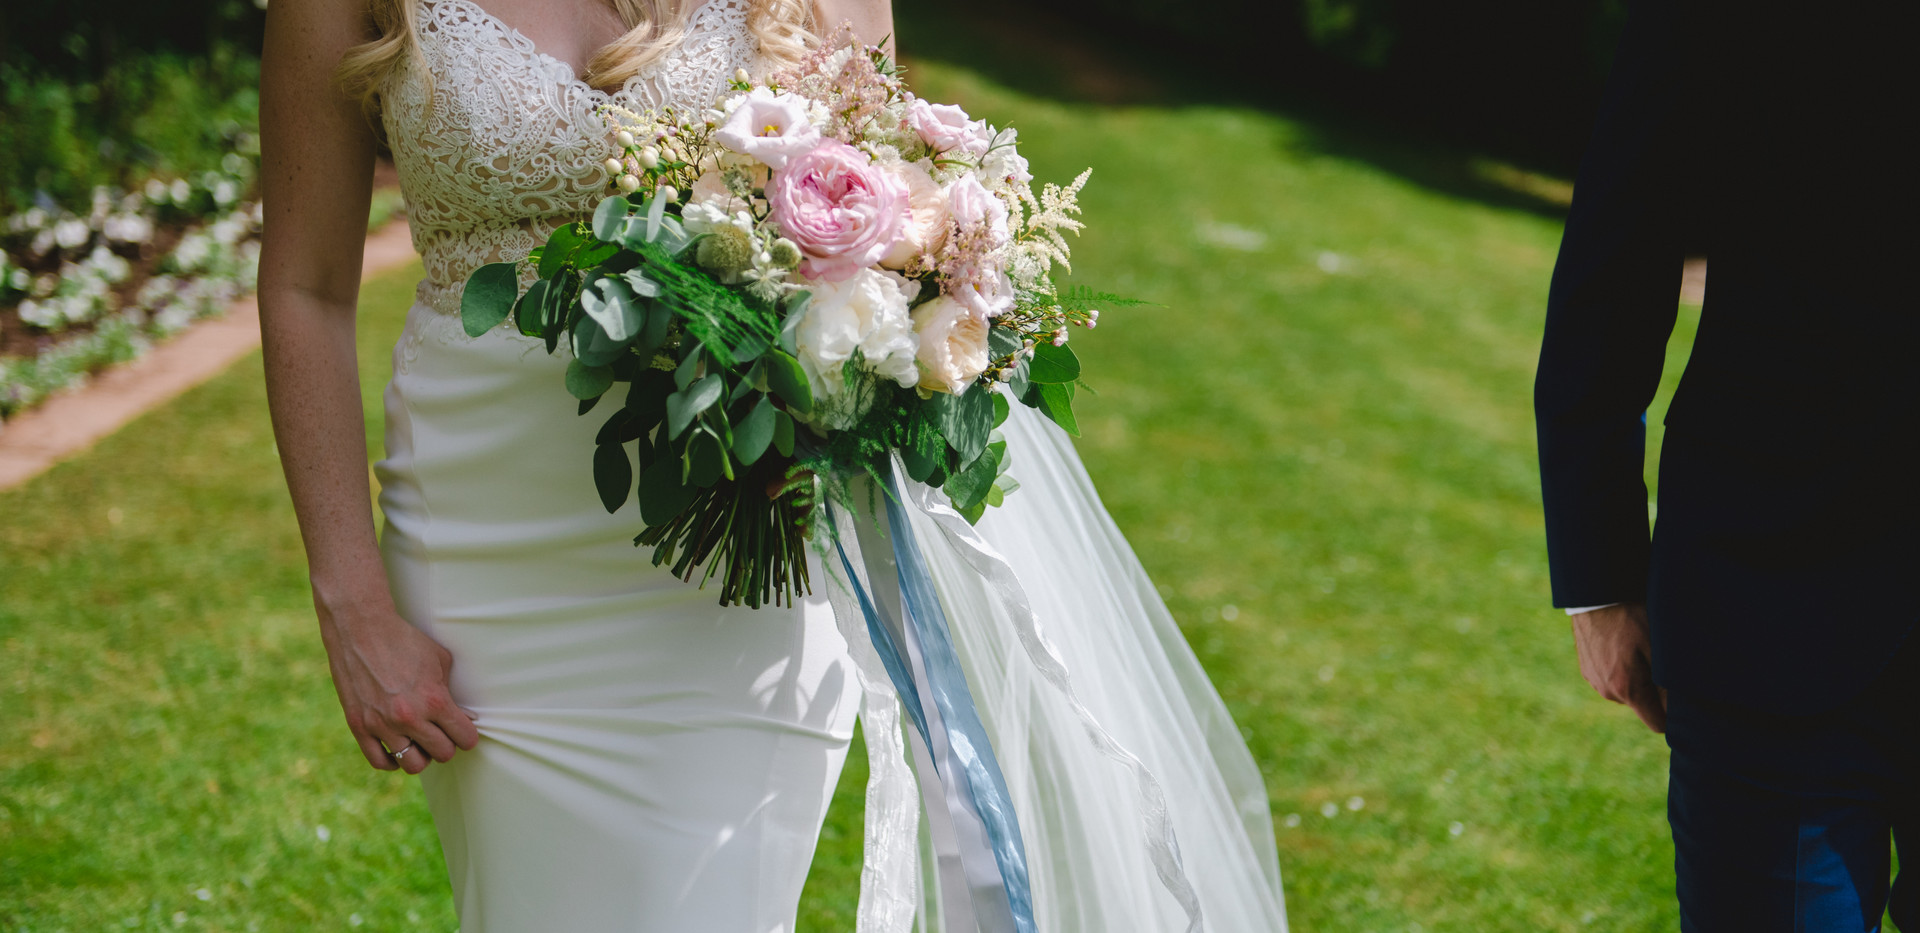 Romantic wedding flower bouquet